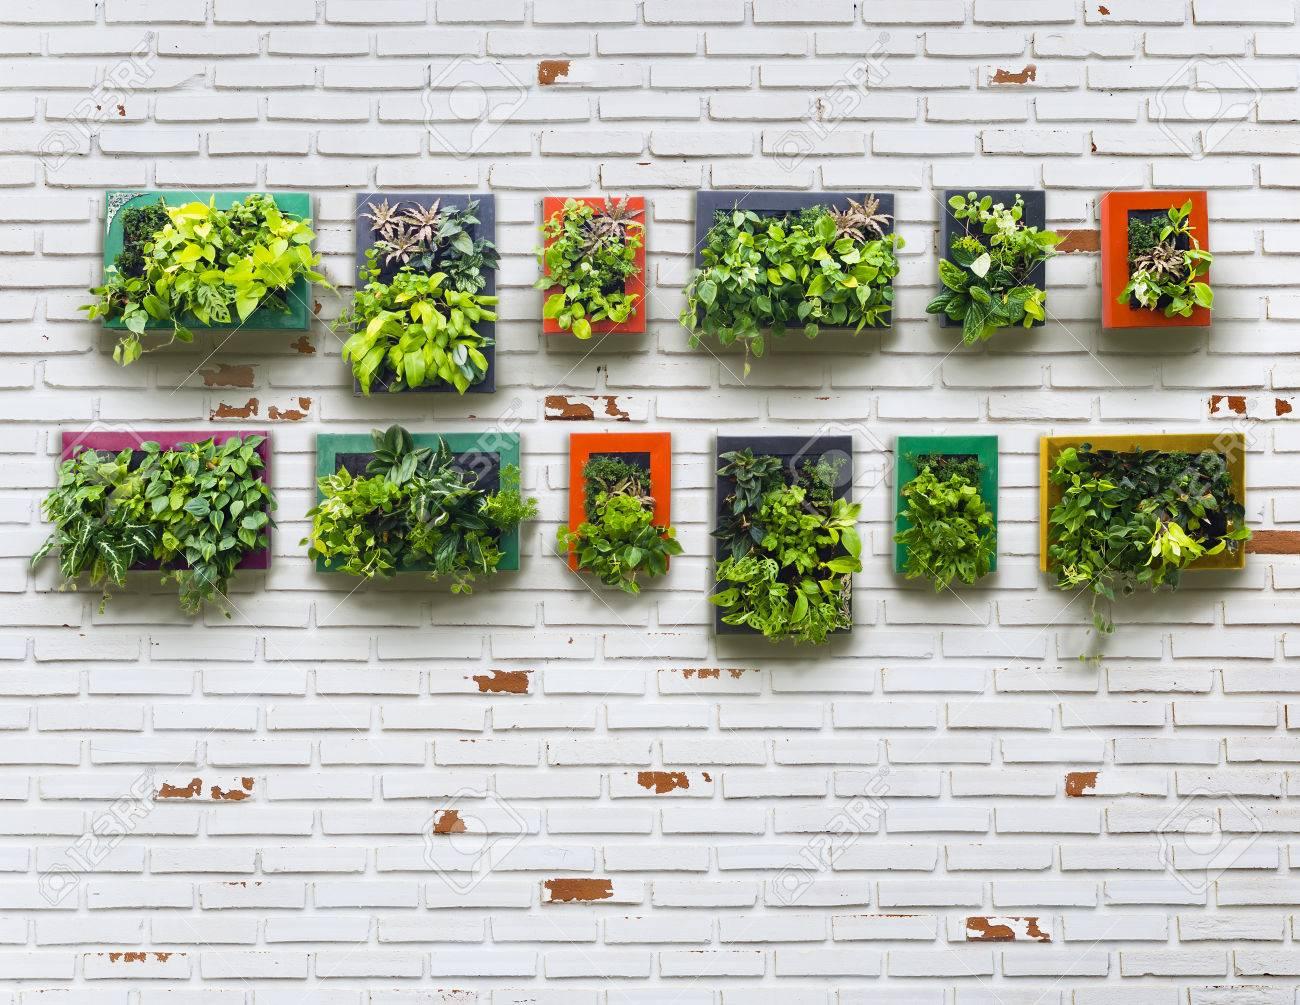 Vertical Garden On White Brick Wall Vintage Style Stock Photo